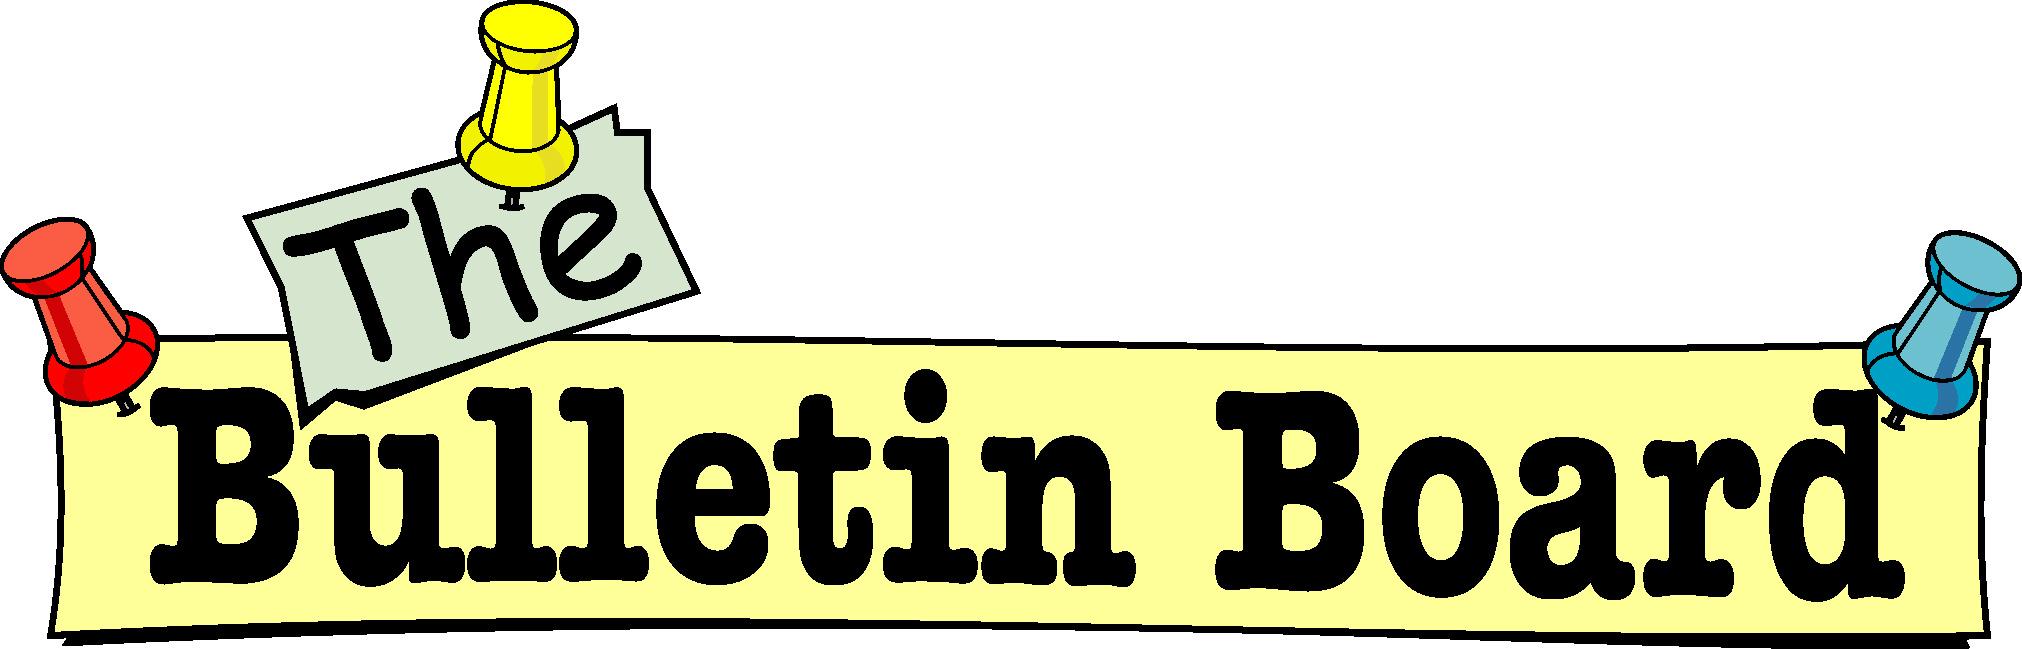 bulletin-board-clipart-free-6.jpg